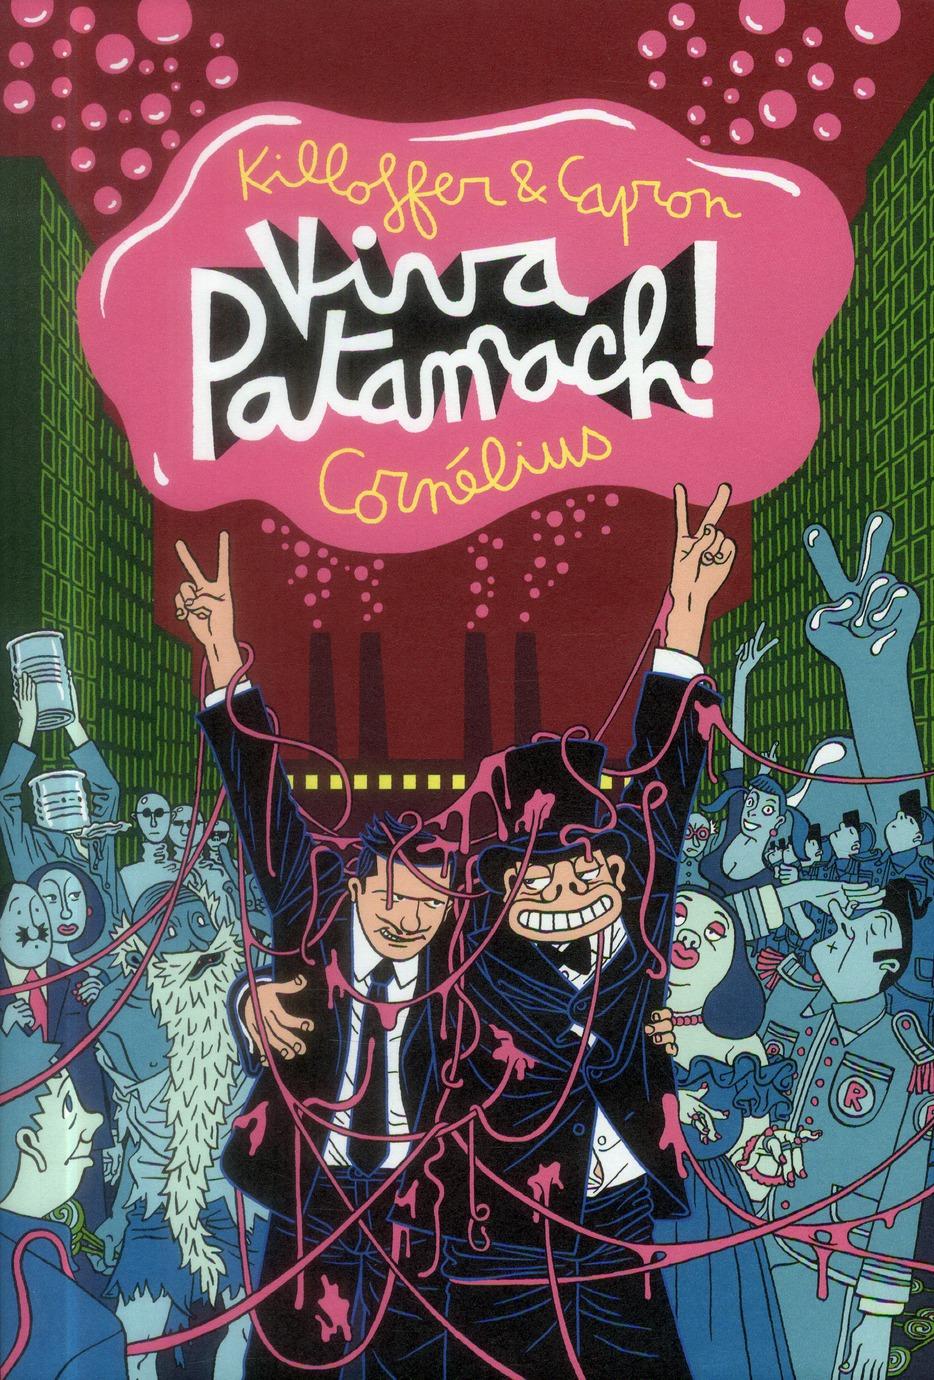 Viva Patamach